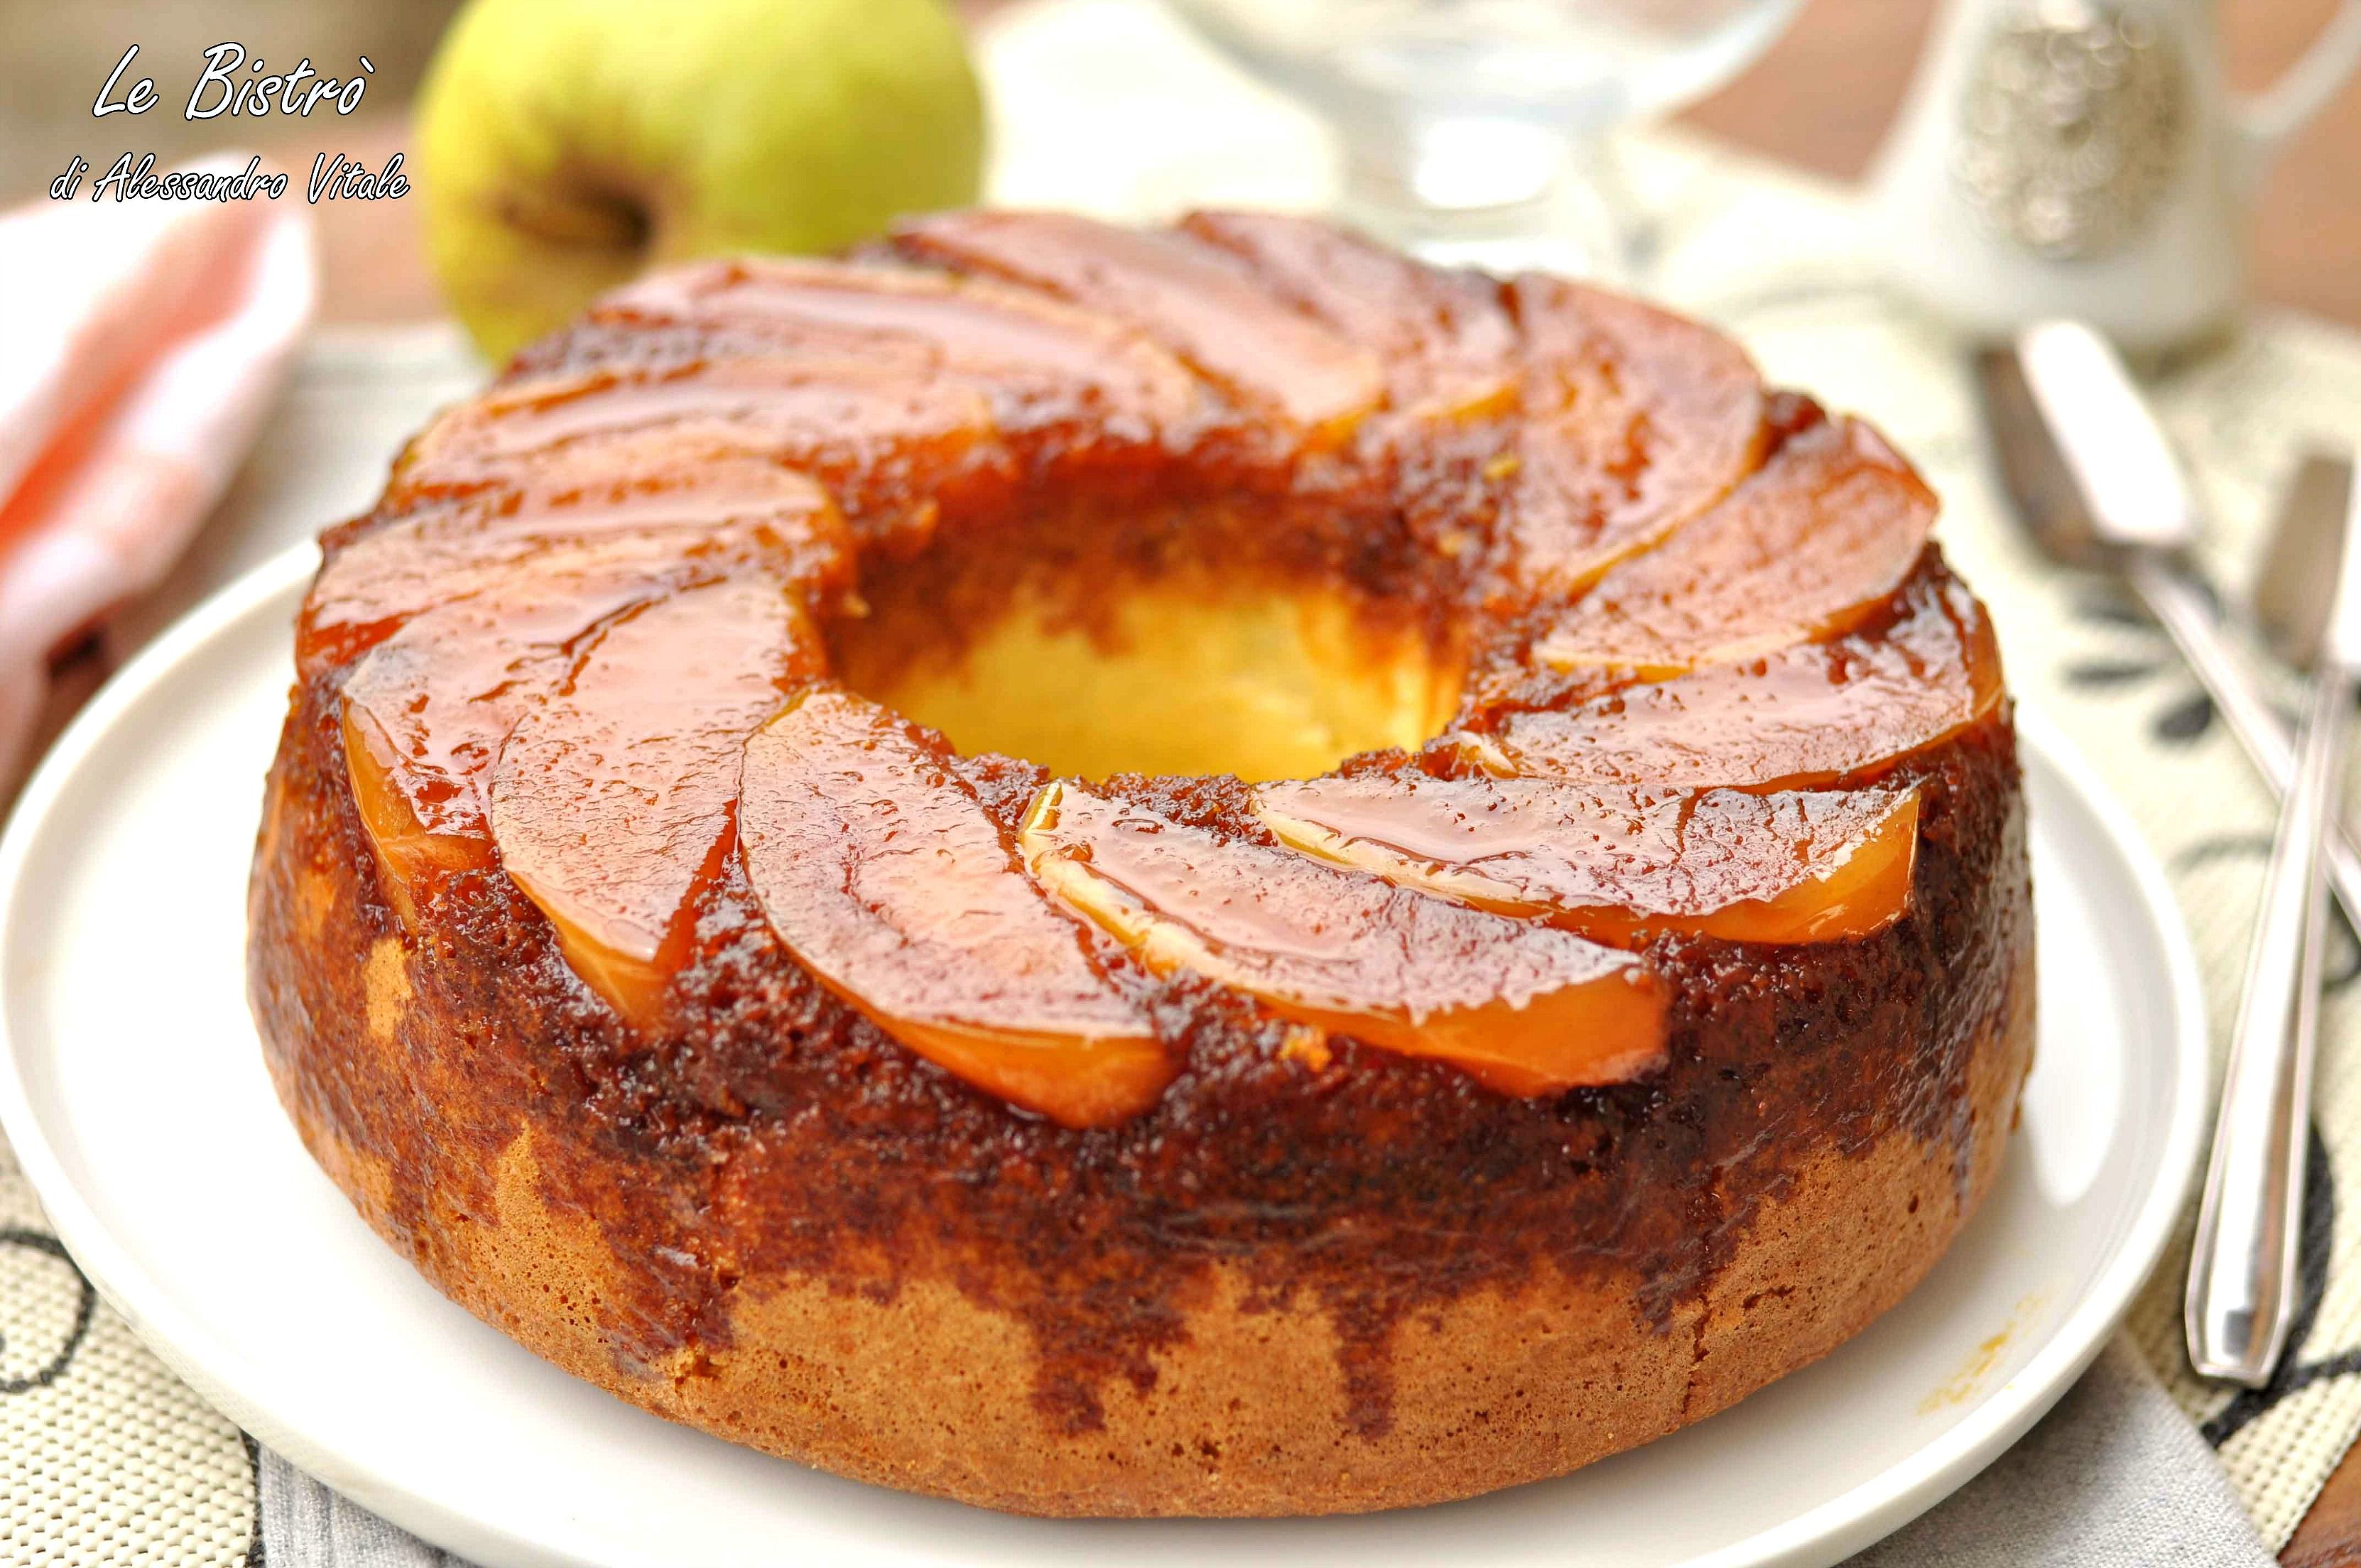 Torta di mele rovesciata, ricetta furba